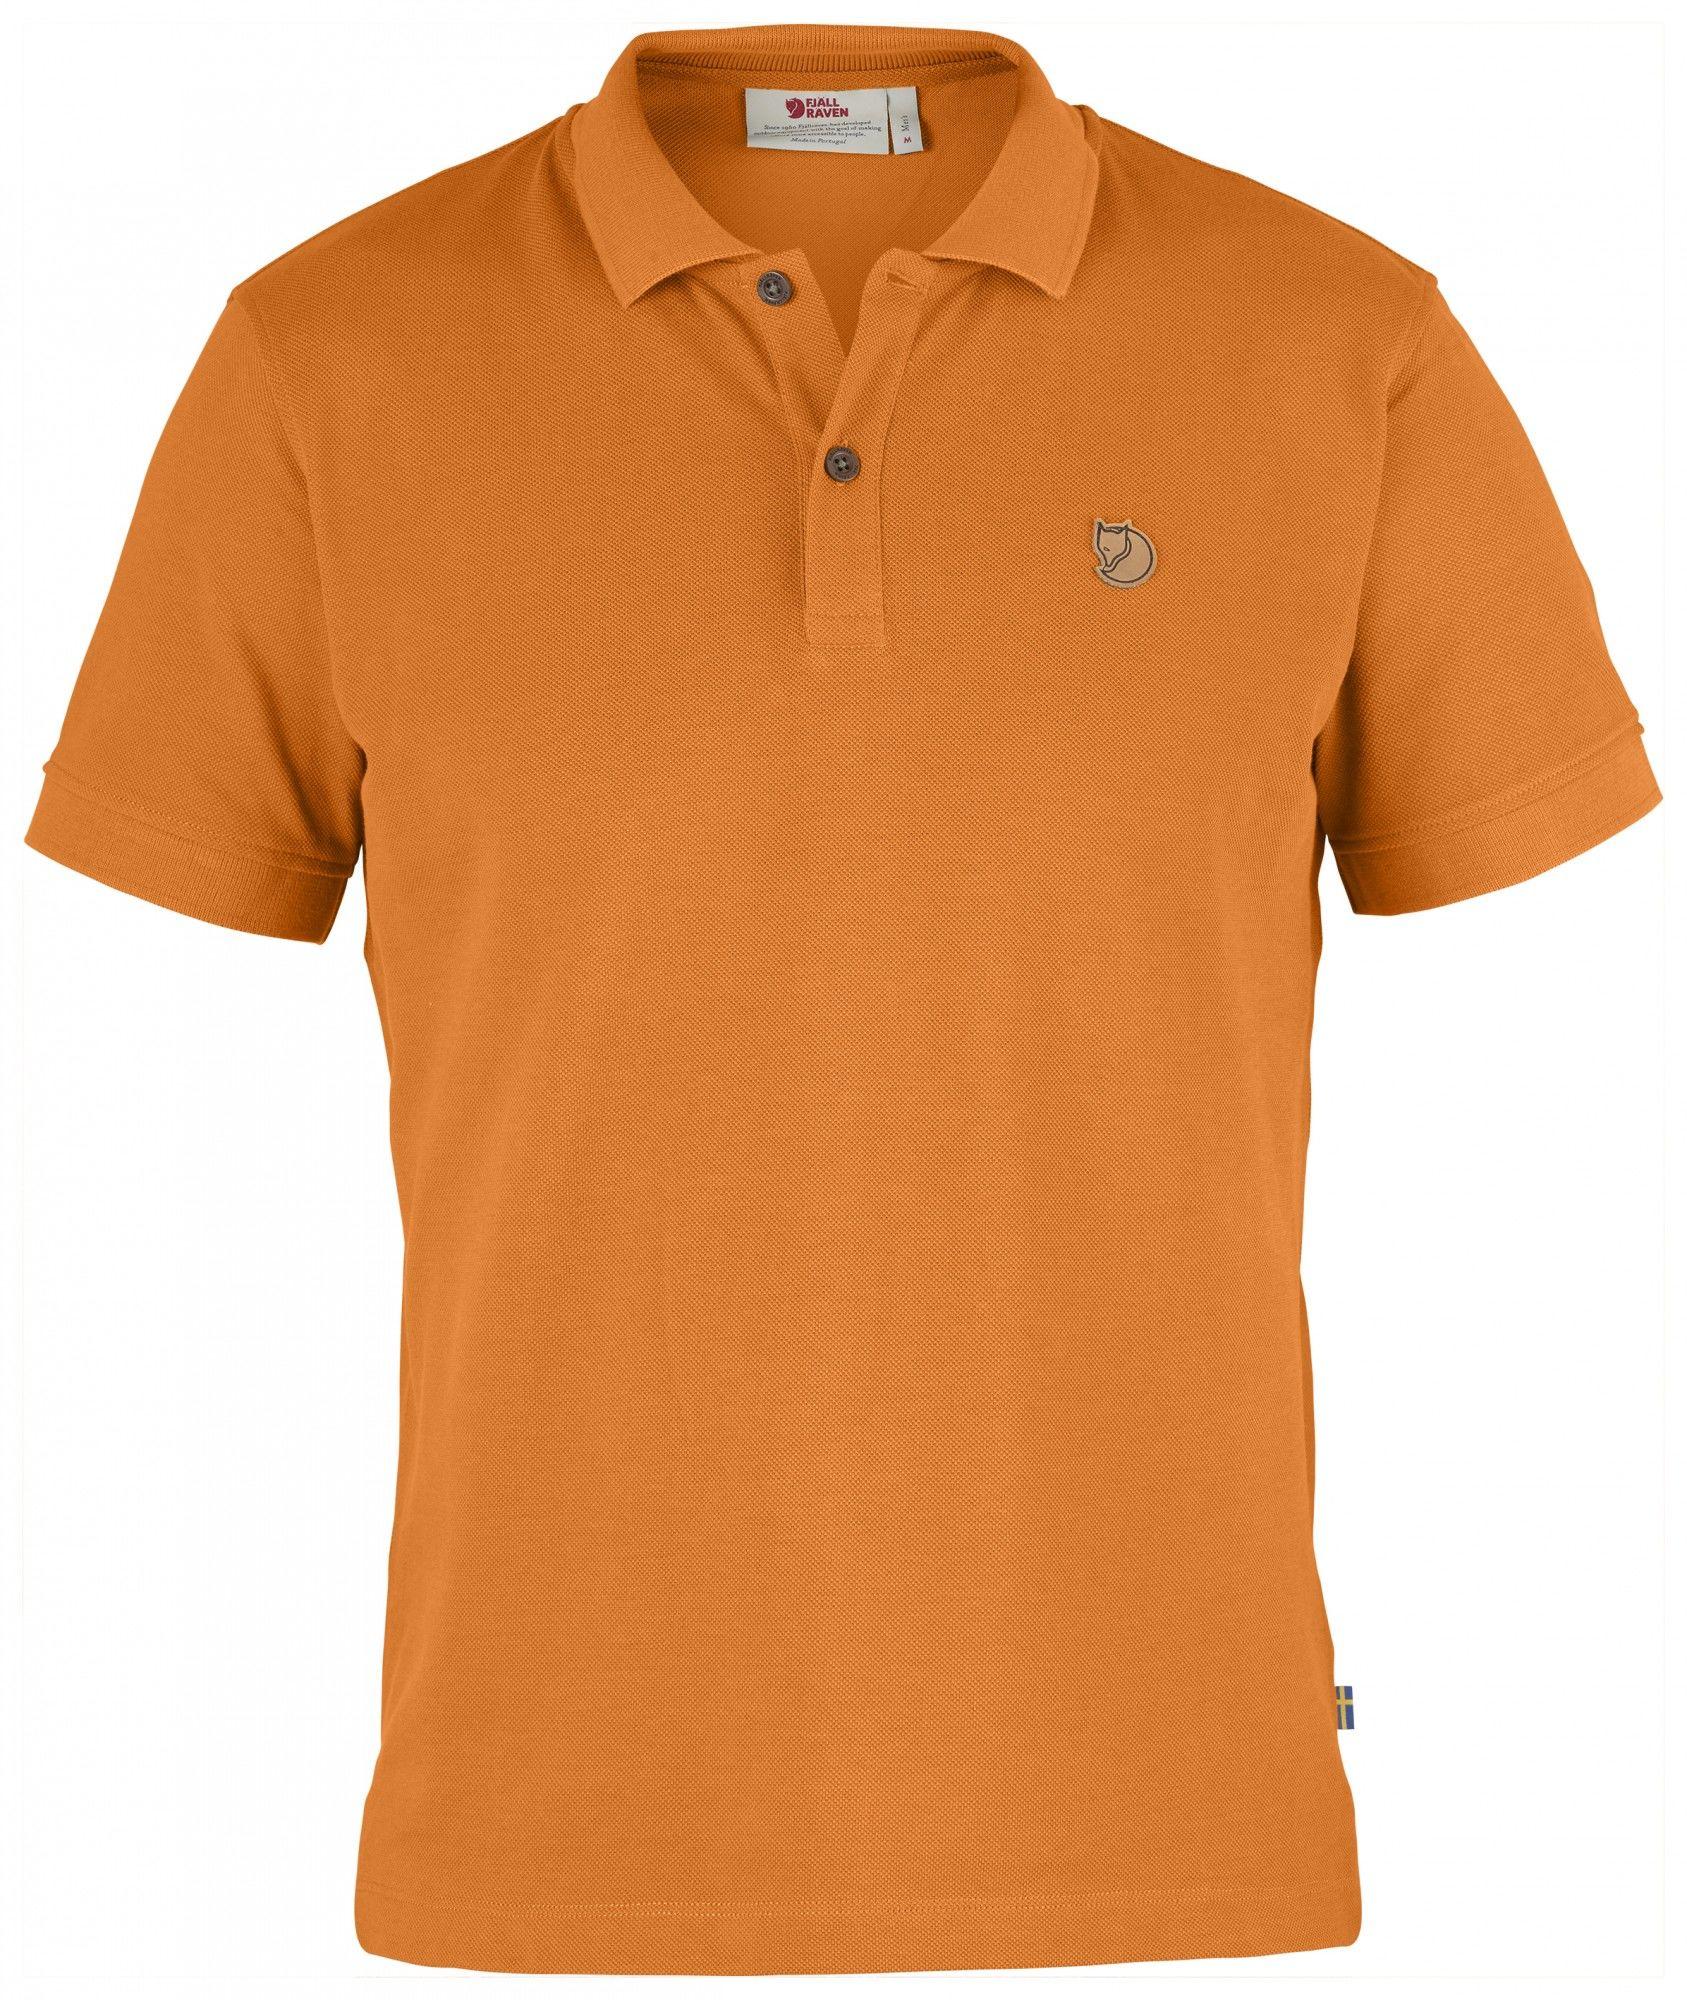 Fjällräven övik Polo Shirt Orange, Male Kurzarm-Polos, S